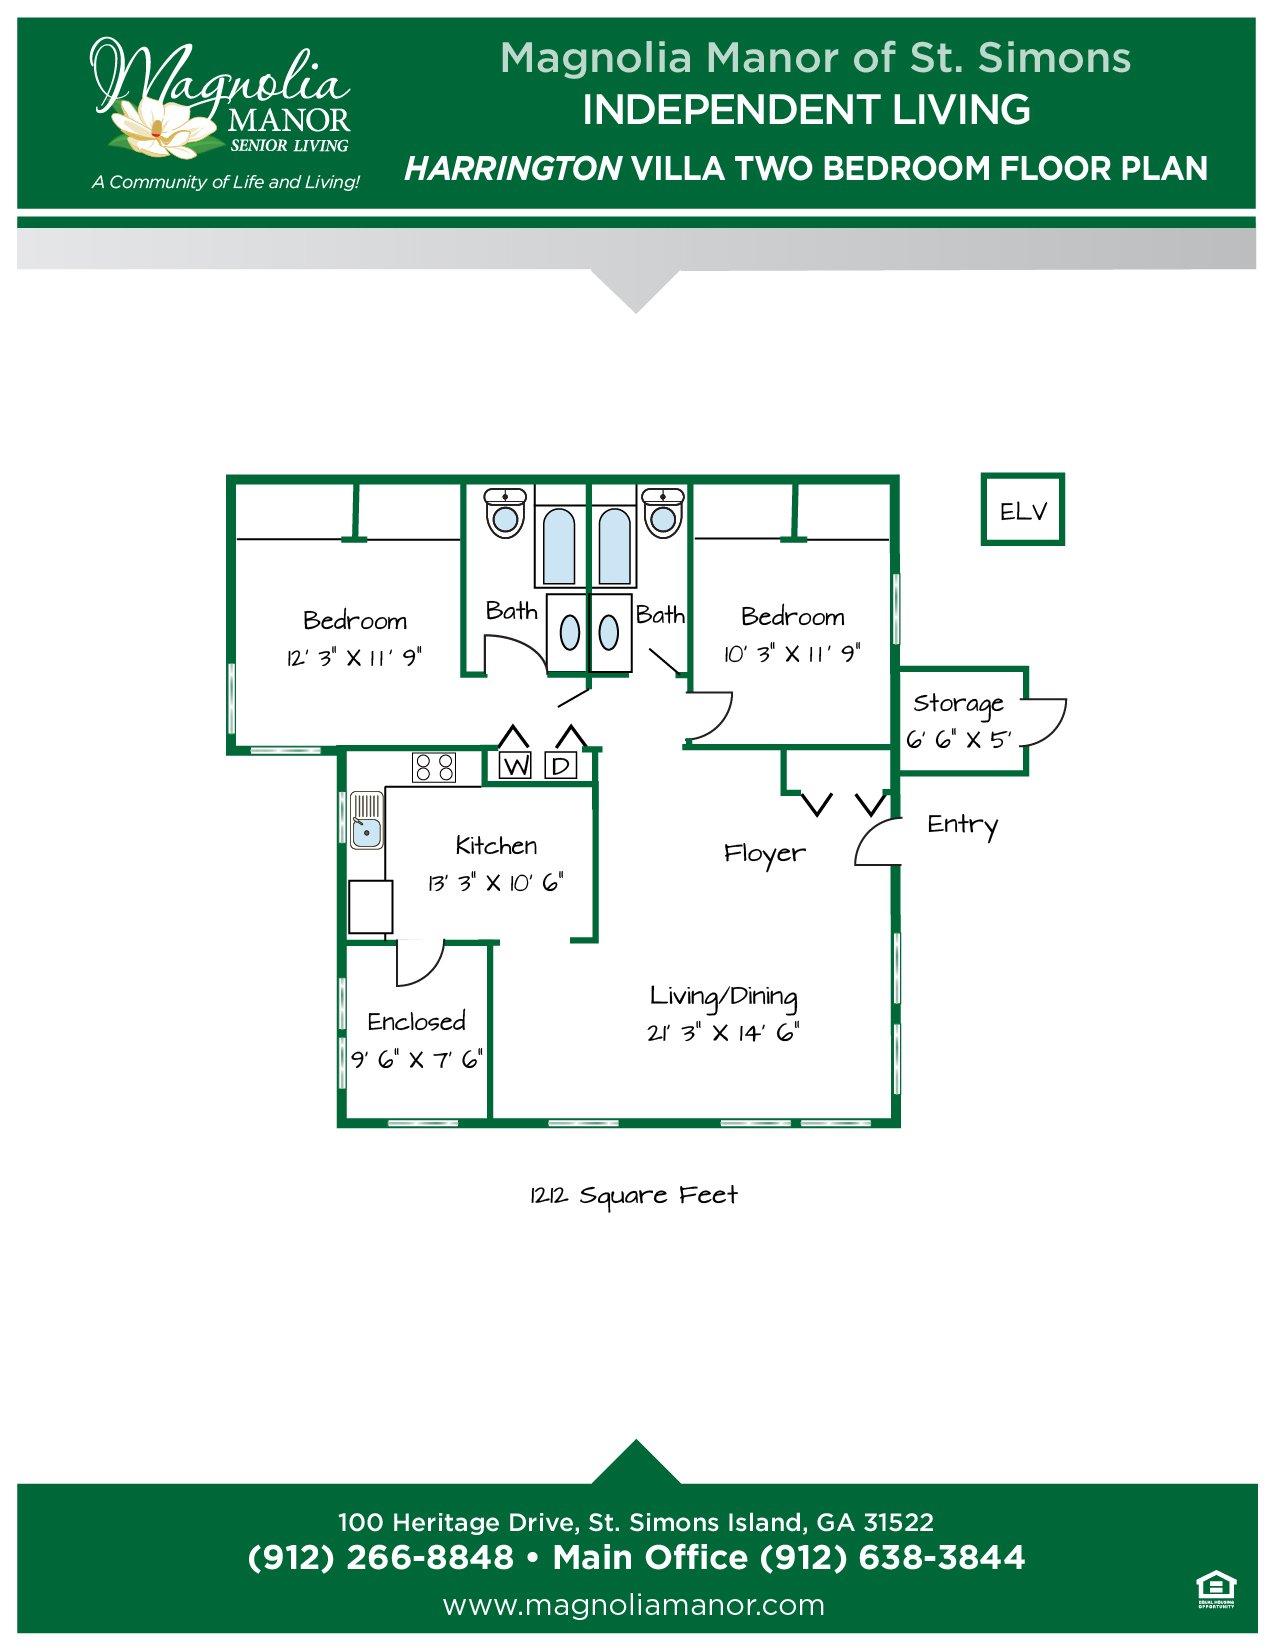 00344 St Simons IL HARRINGTON VILLA Floor Plans 2019-01